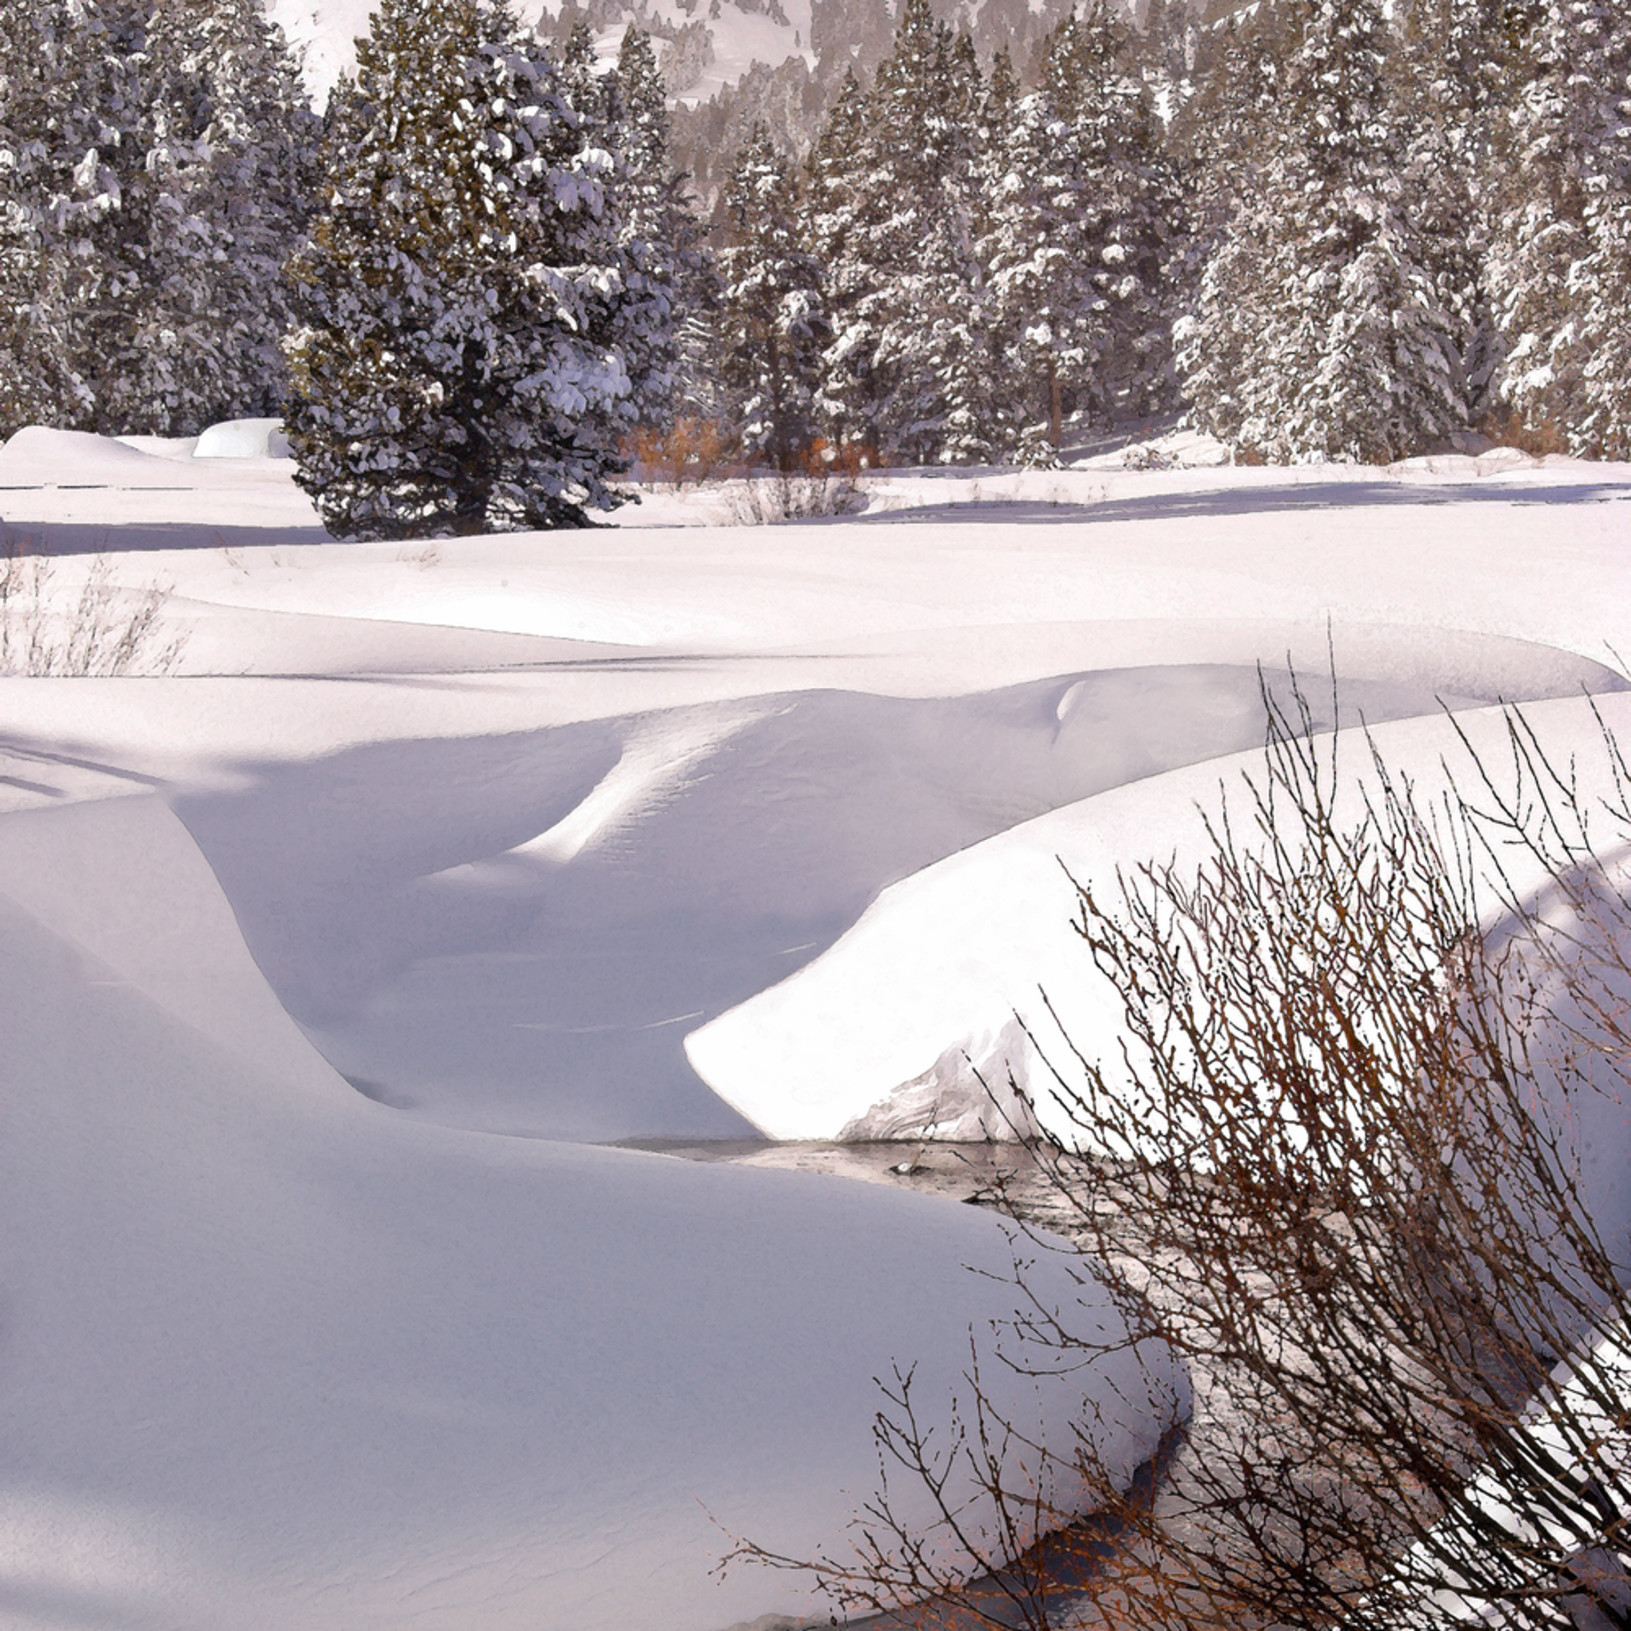 Prosser creek euer valley f2tuqg